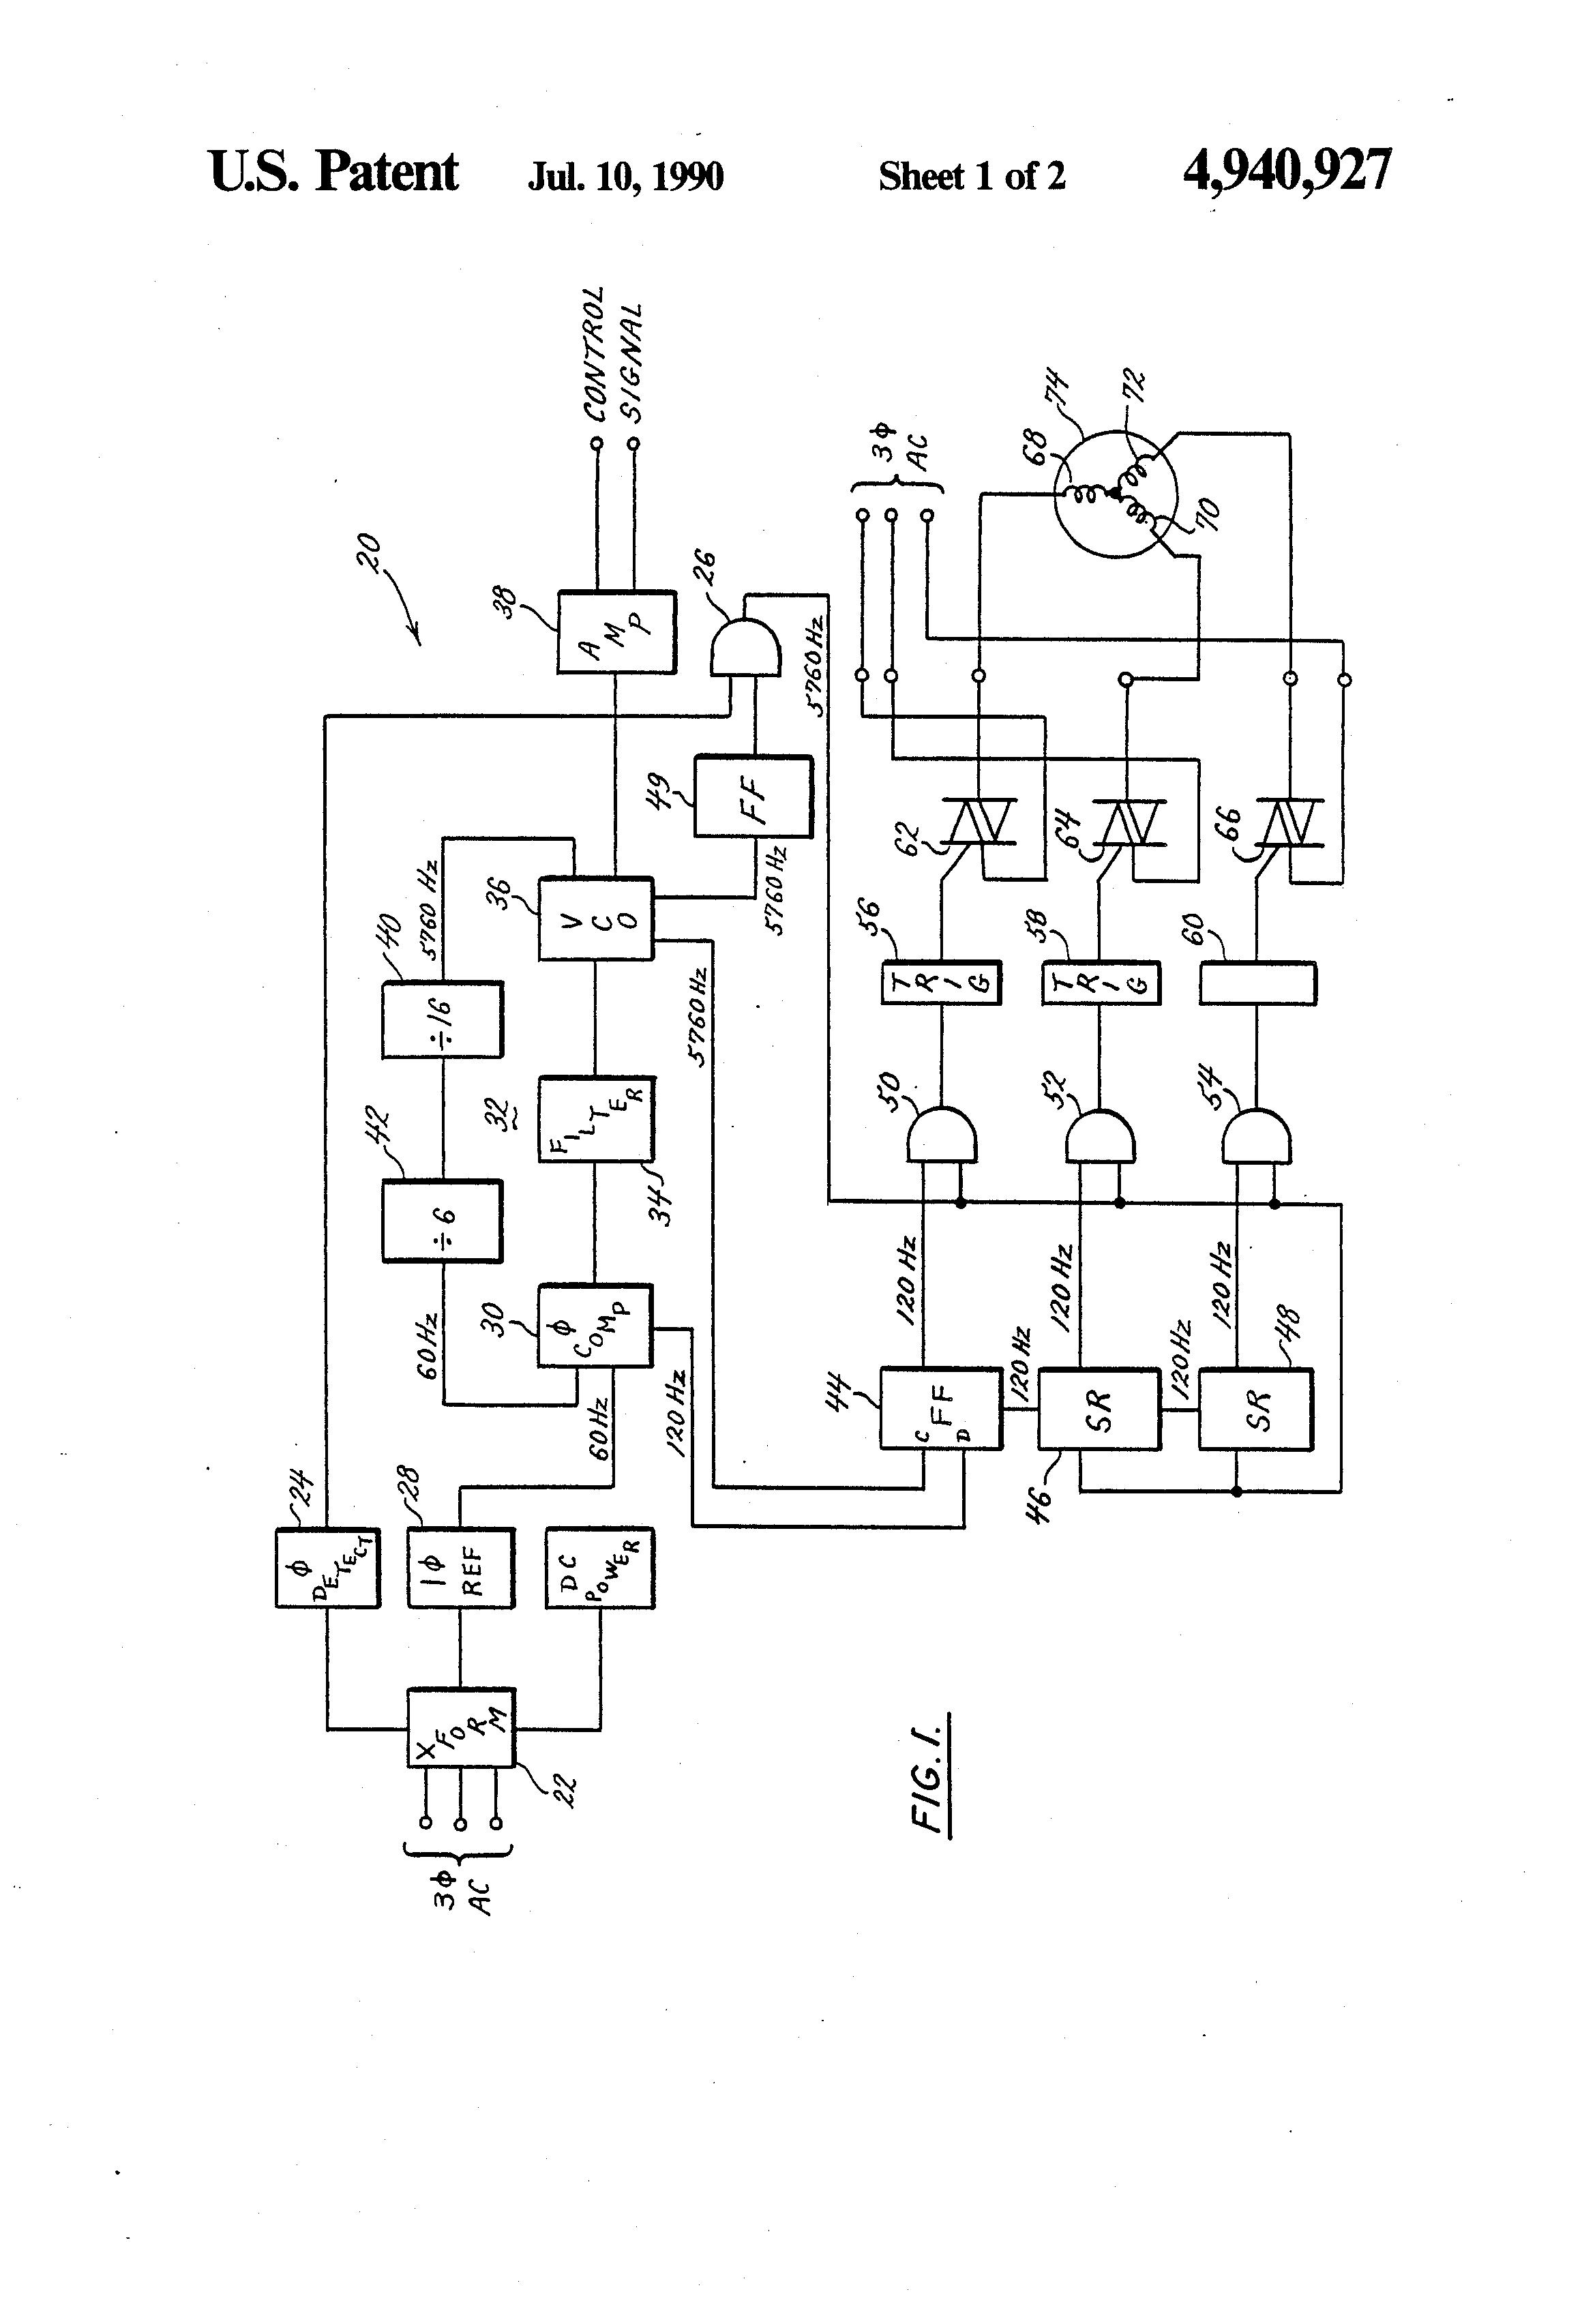 Magnetek Model 6415 manual on